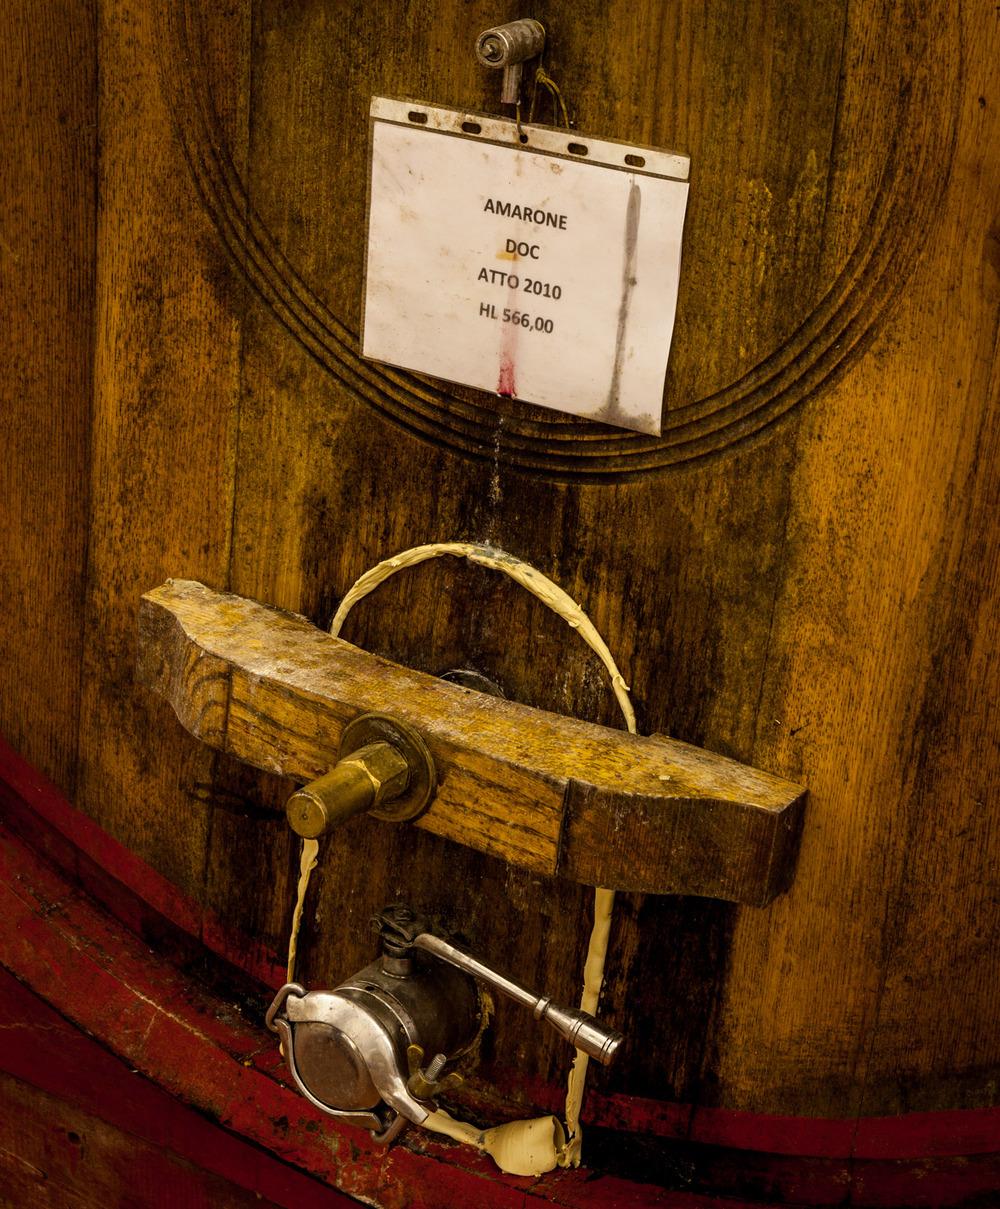 Italy : Veneto : Amarone in cask at Azienda Agricola Brigaldara, San Pietro in Cariano